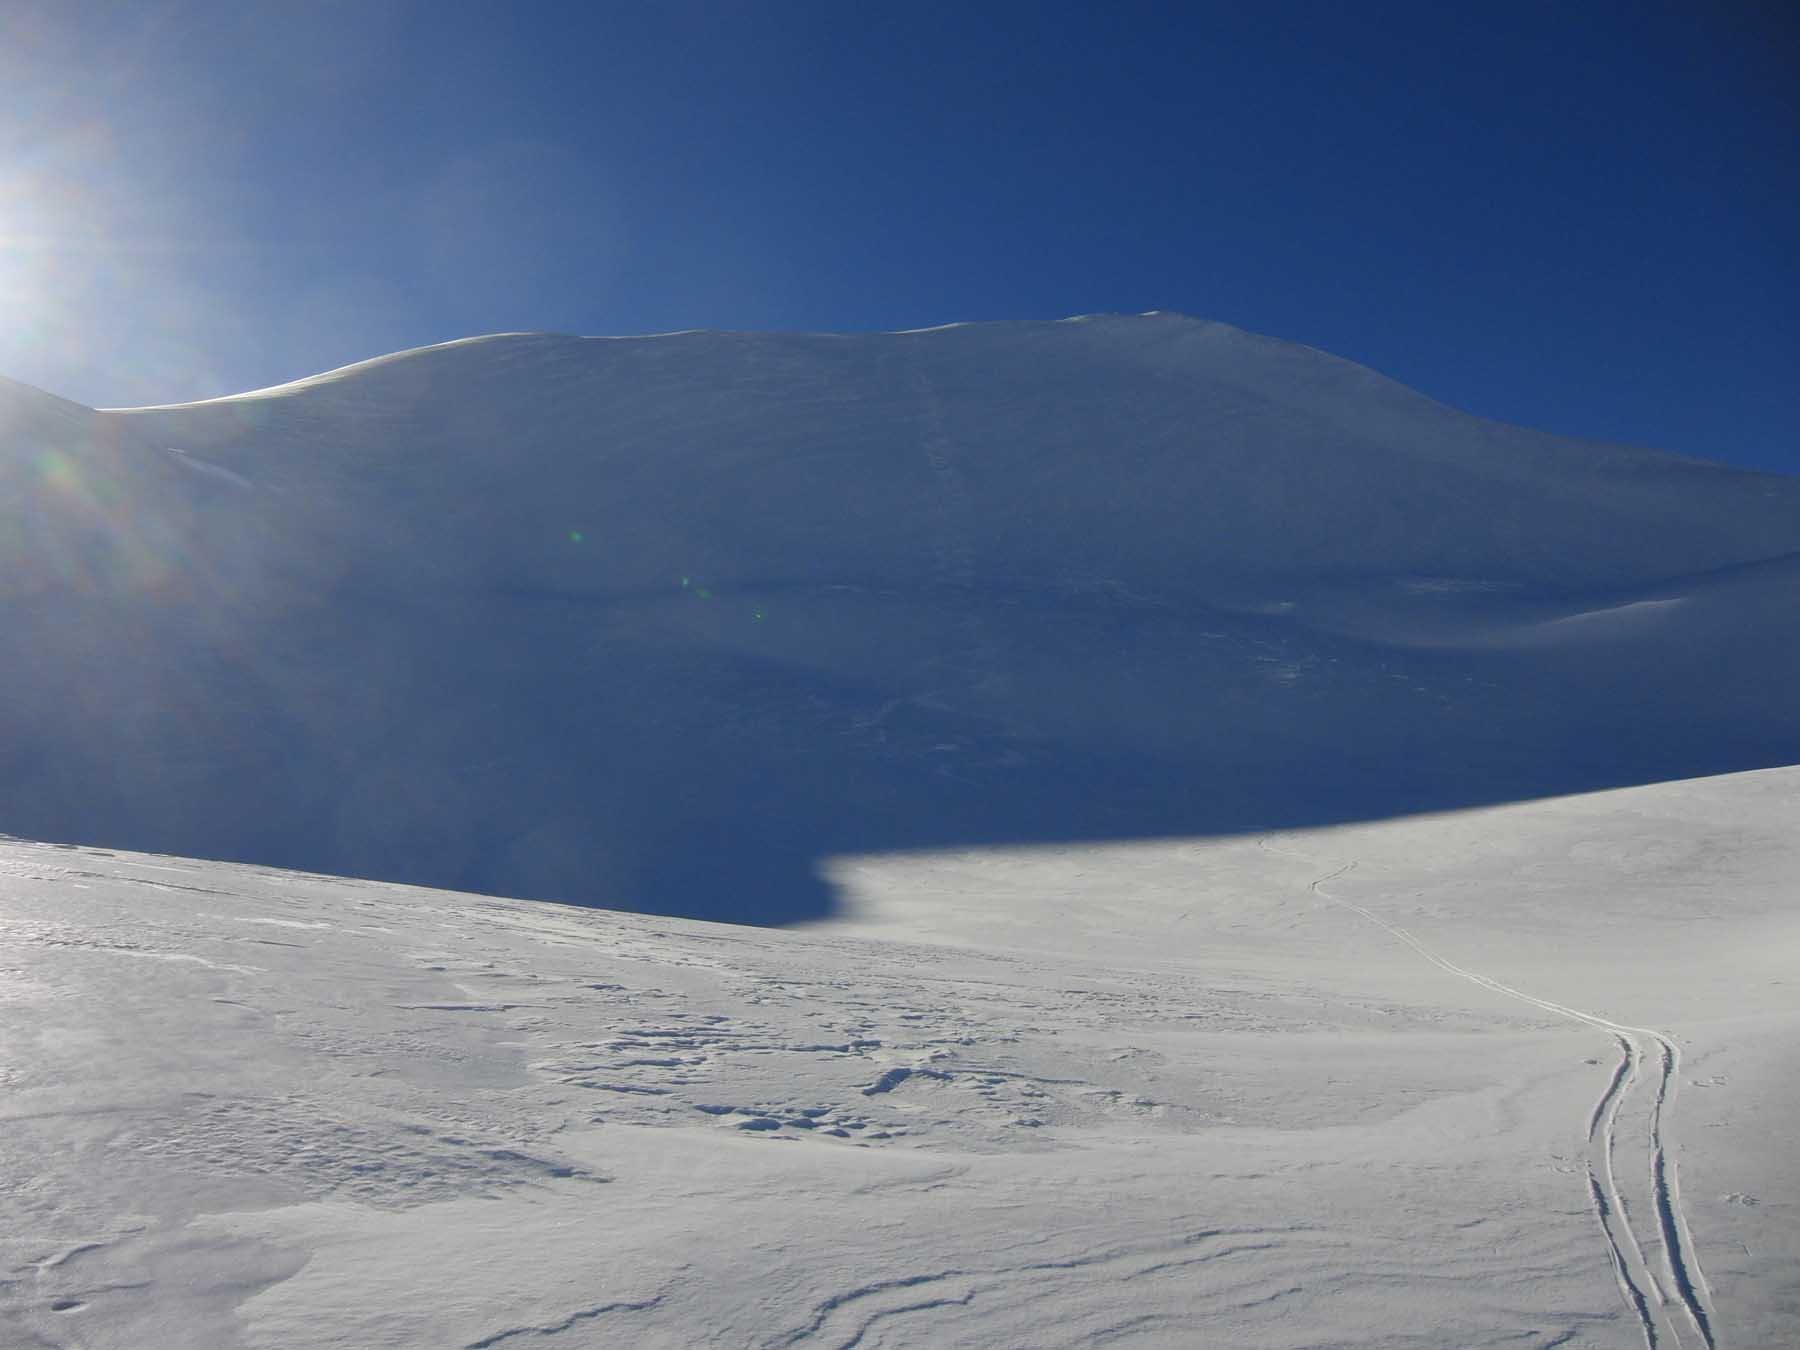 Pendio alto in neve bellissima